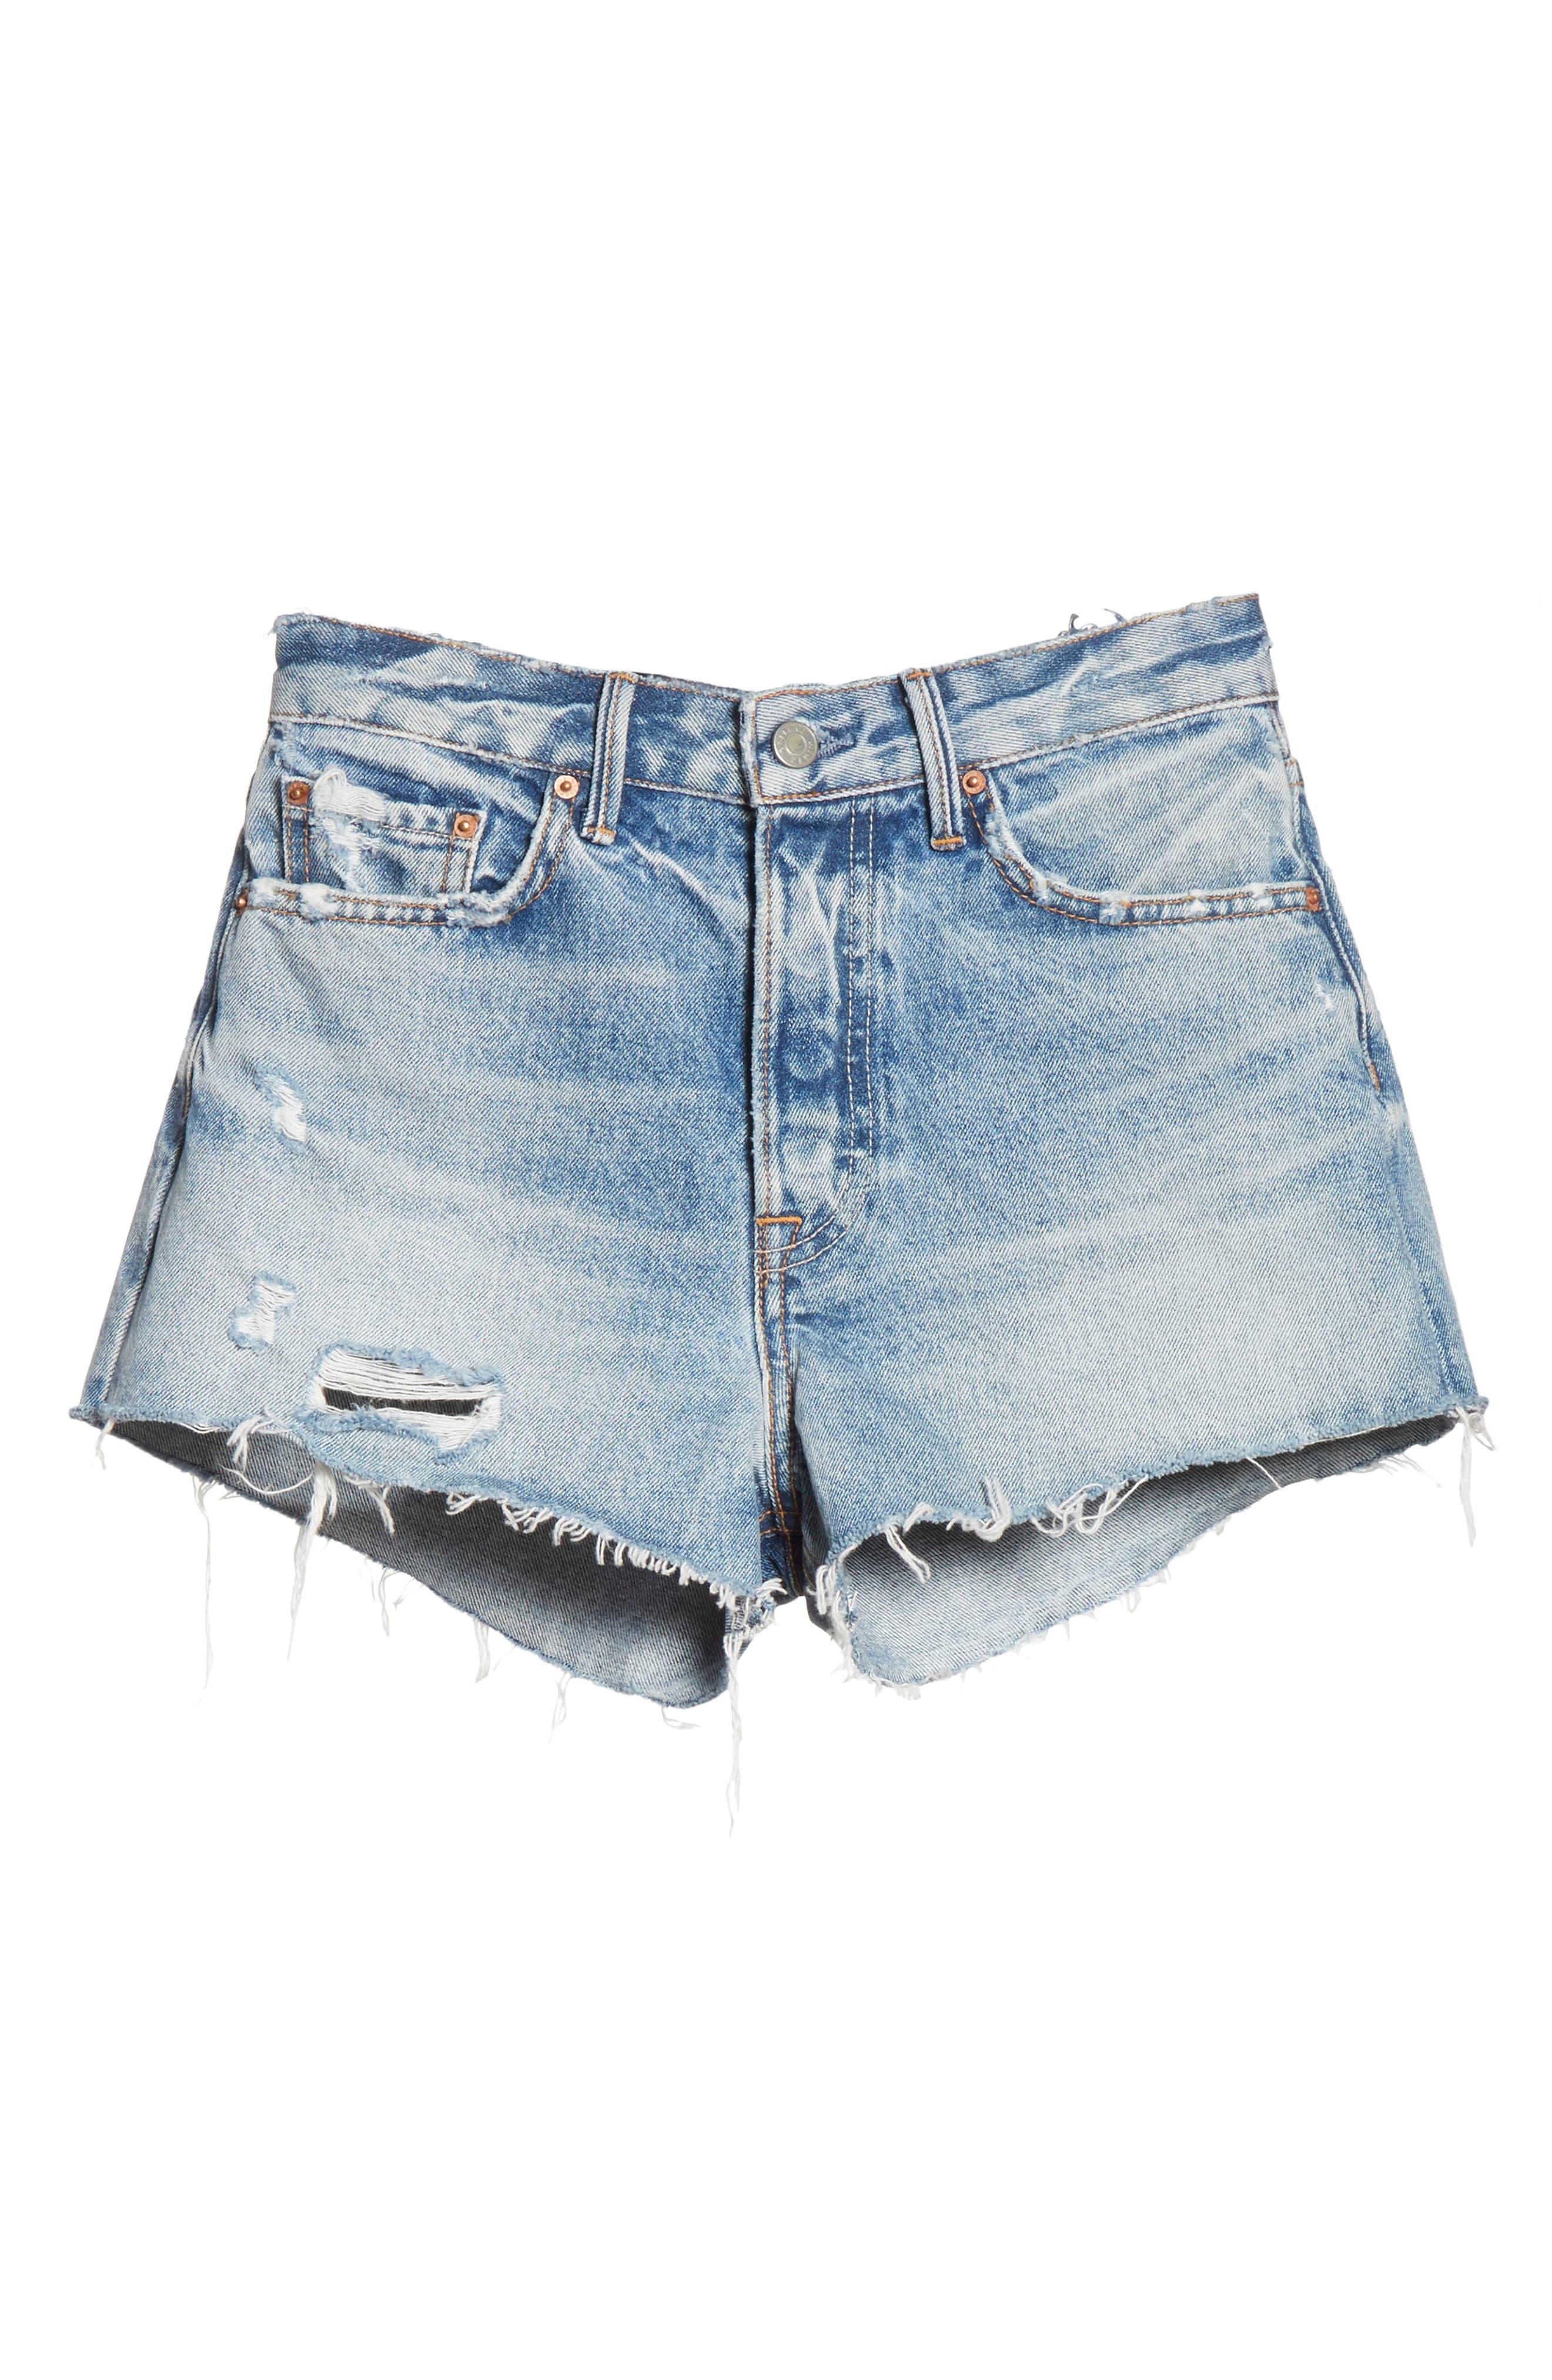 Cindy Rigid High Waist Denim Shorts,                             Alternate thumbnail 6, color,                             473